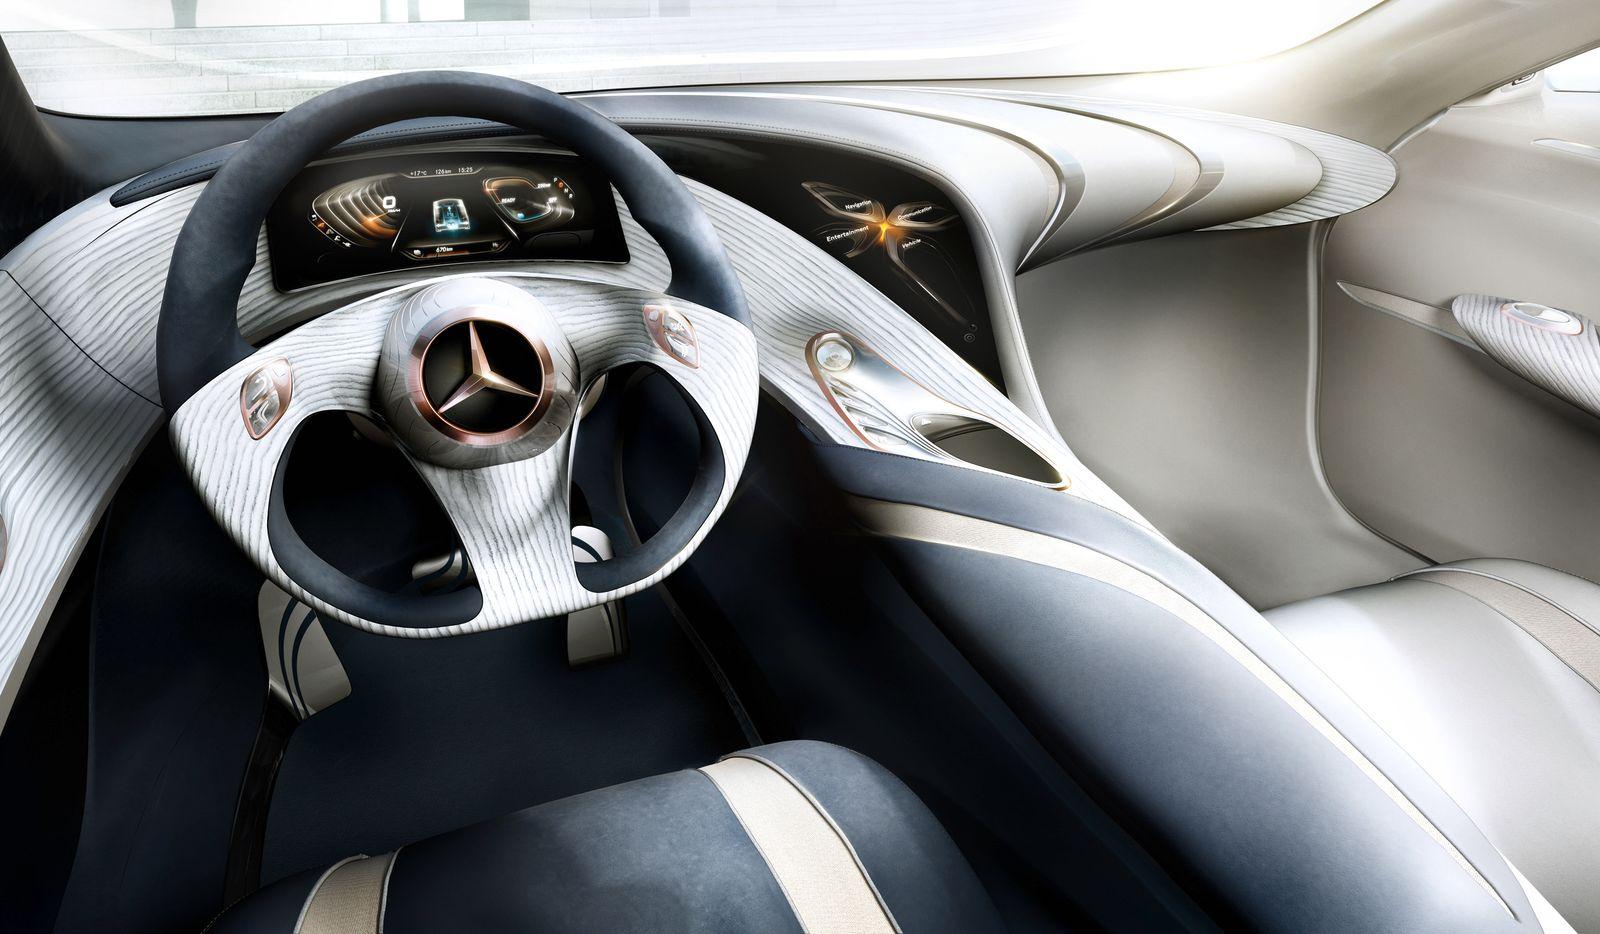 Mercedes F 125 / Design Innen